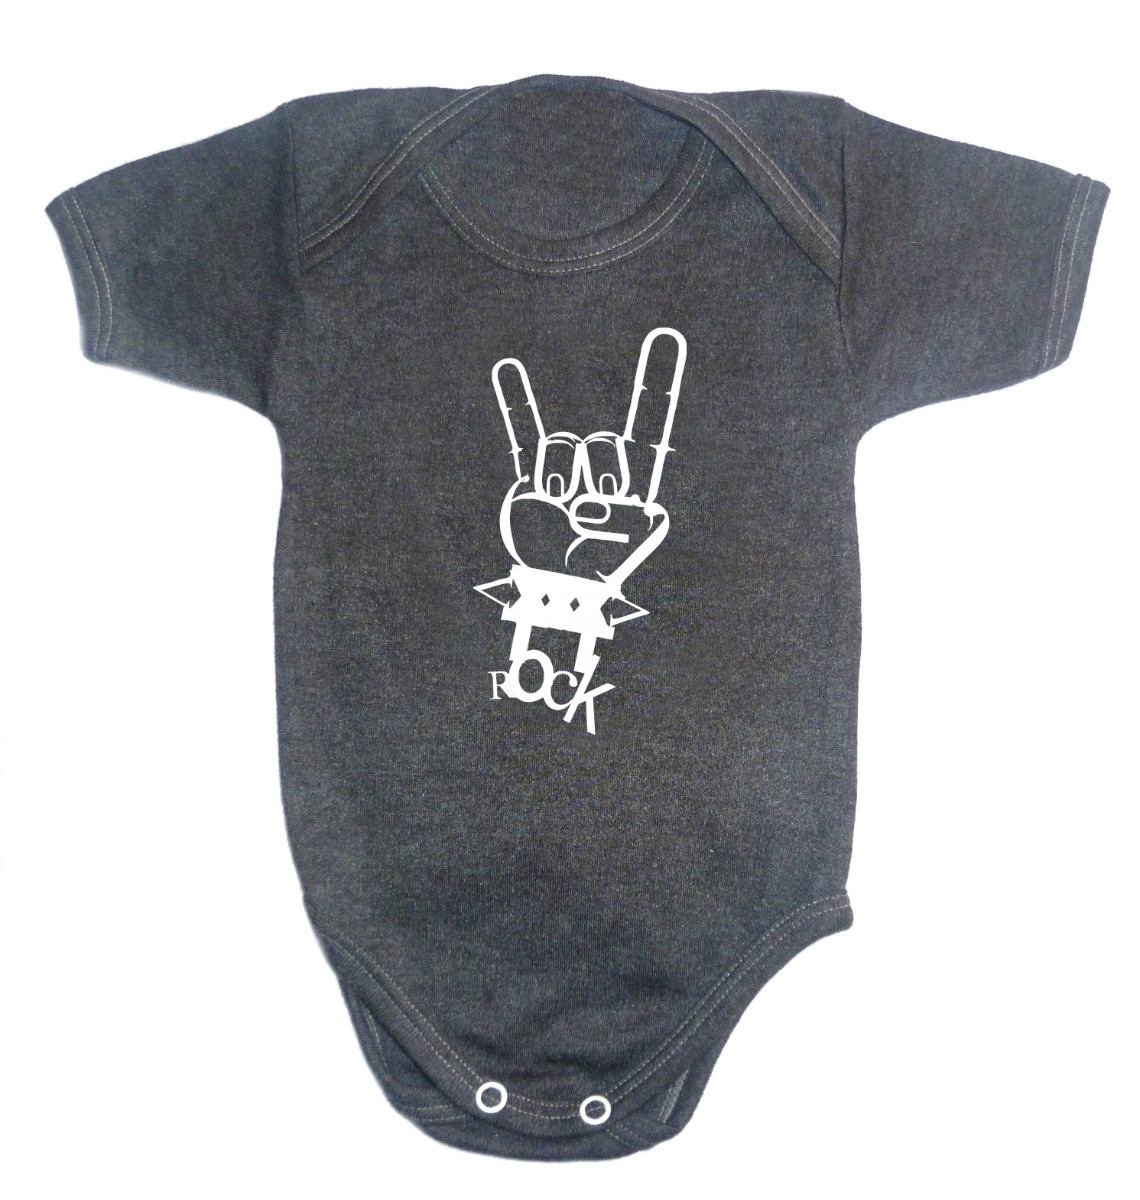 ropa de bebe alternativa